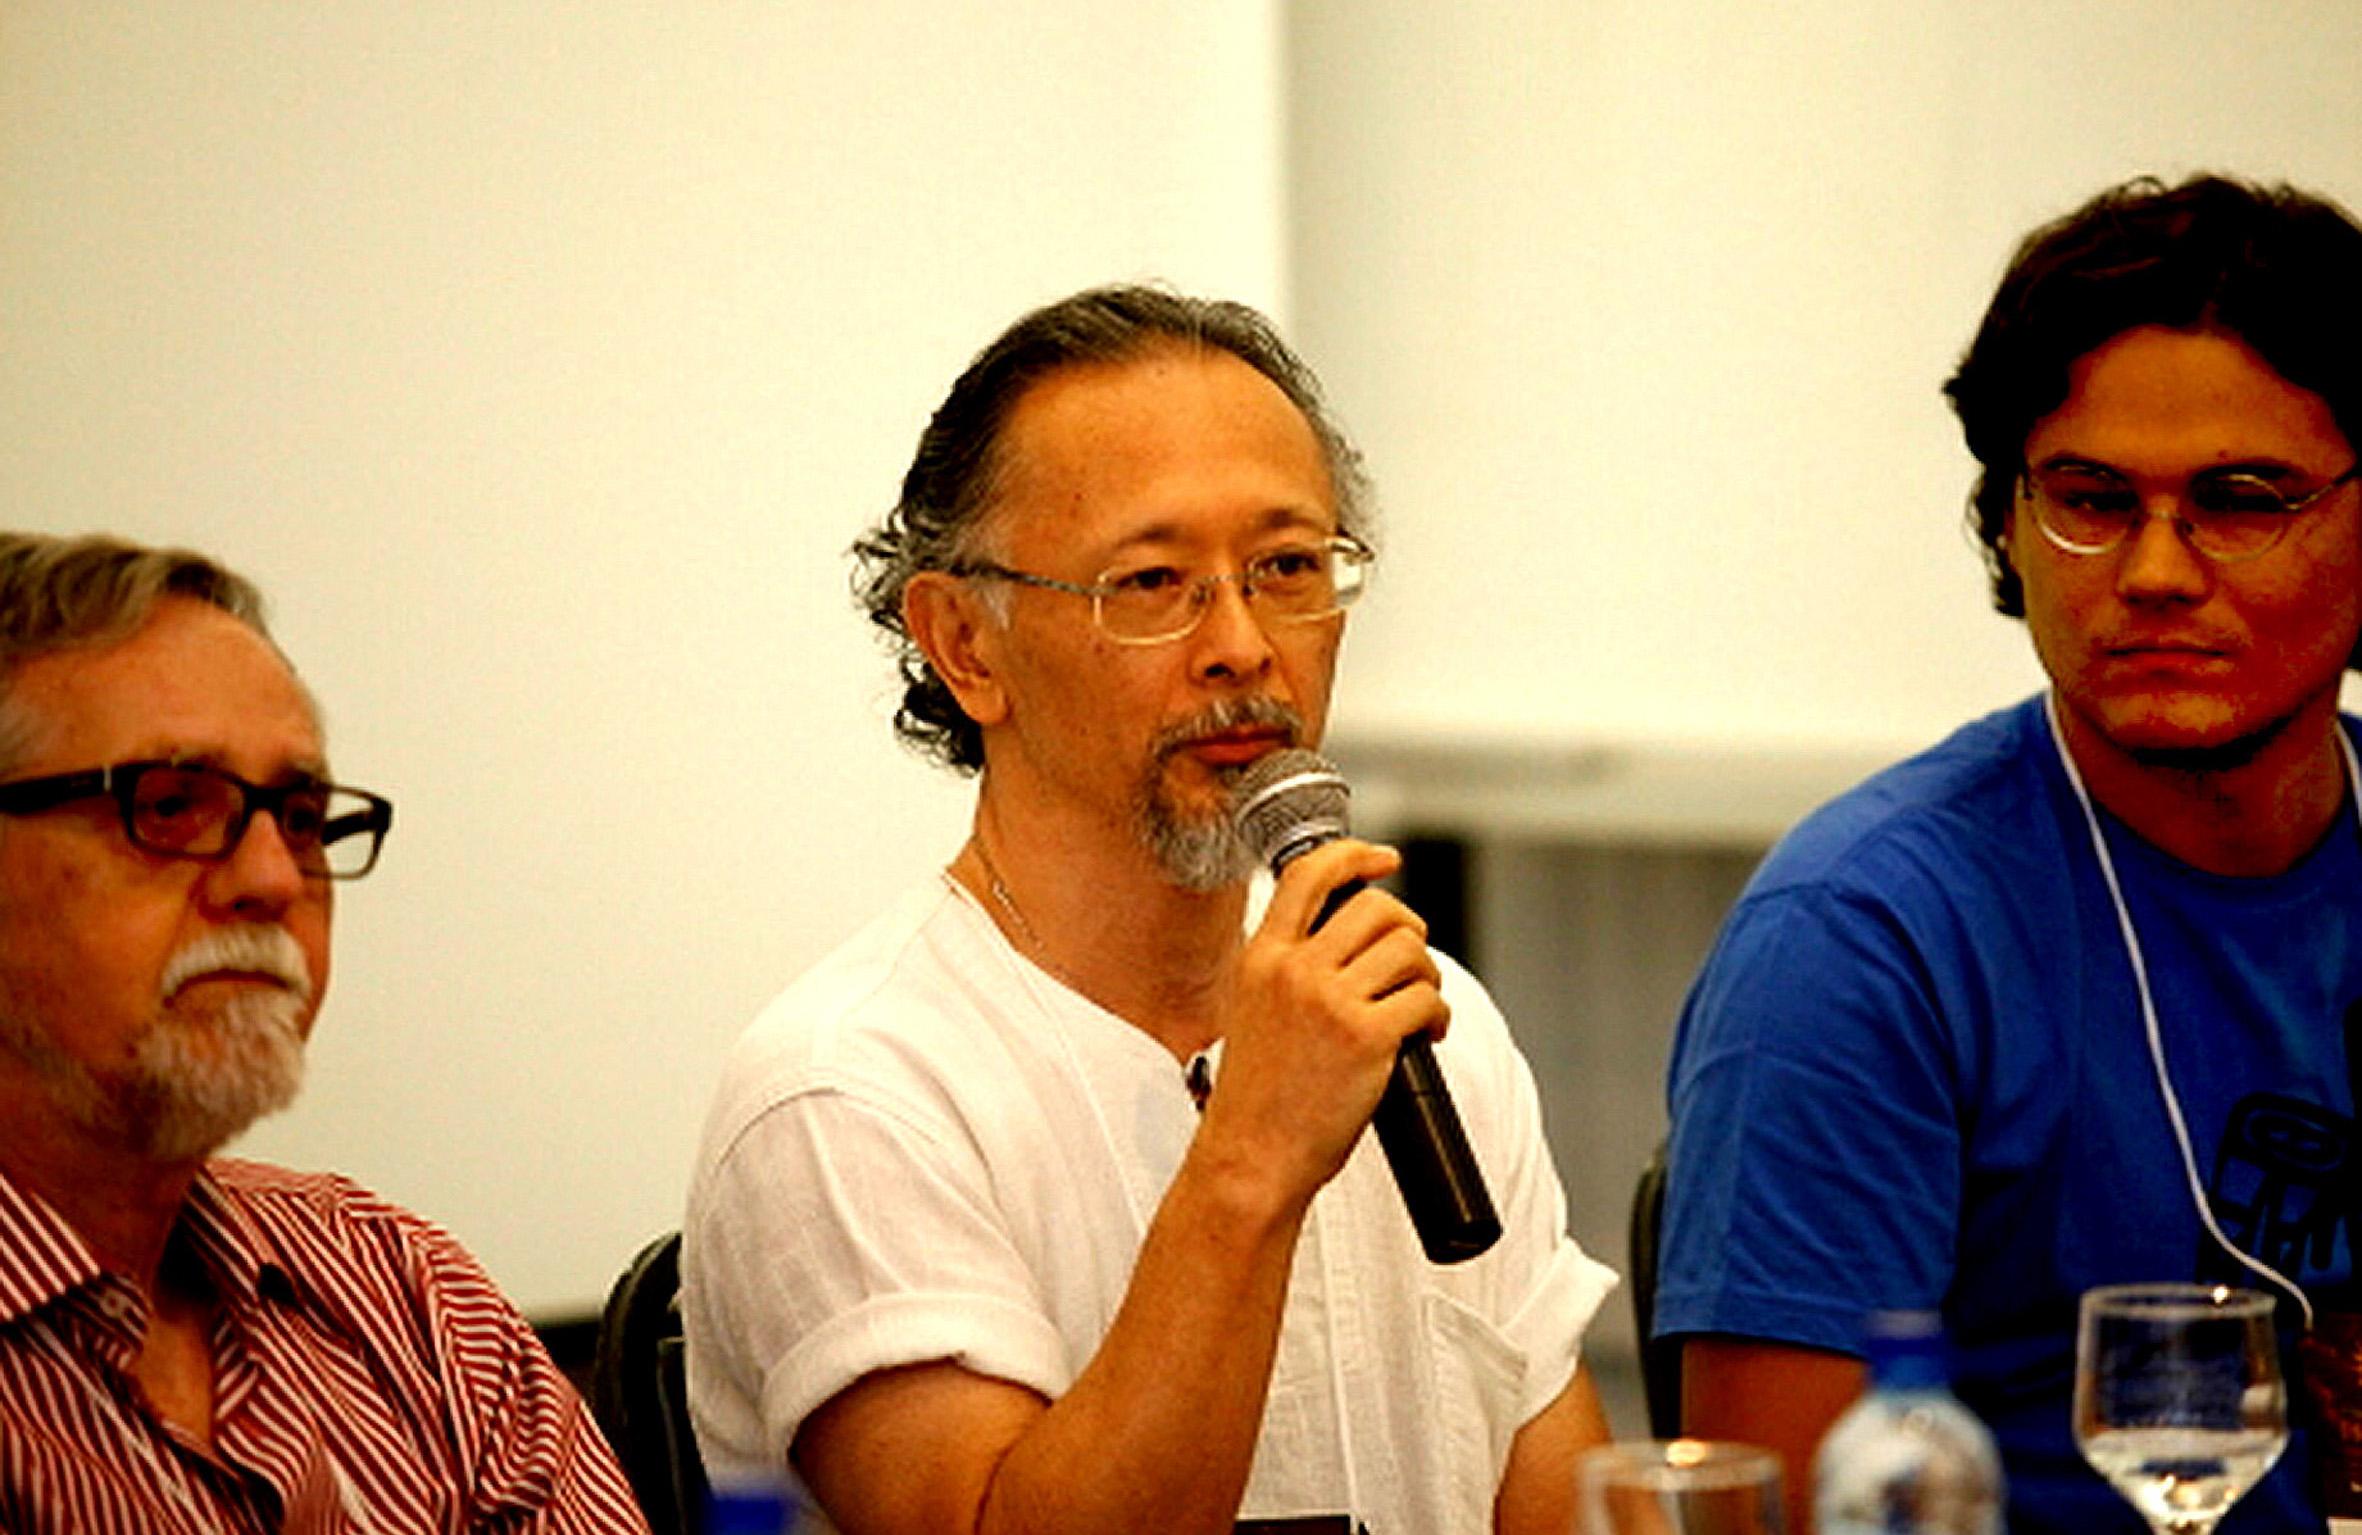 Roberto Otsu é conferencista, professor e escritor